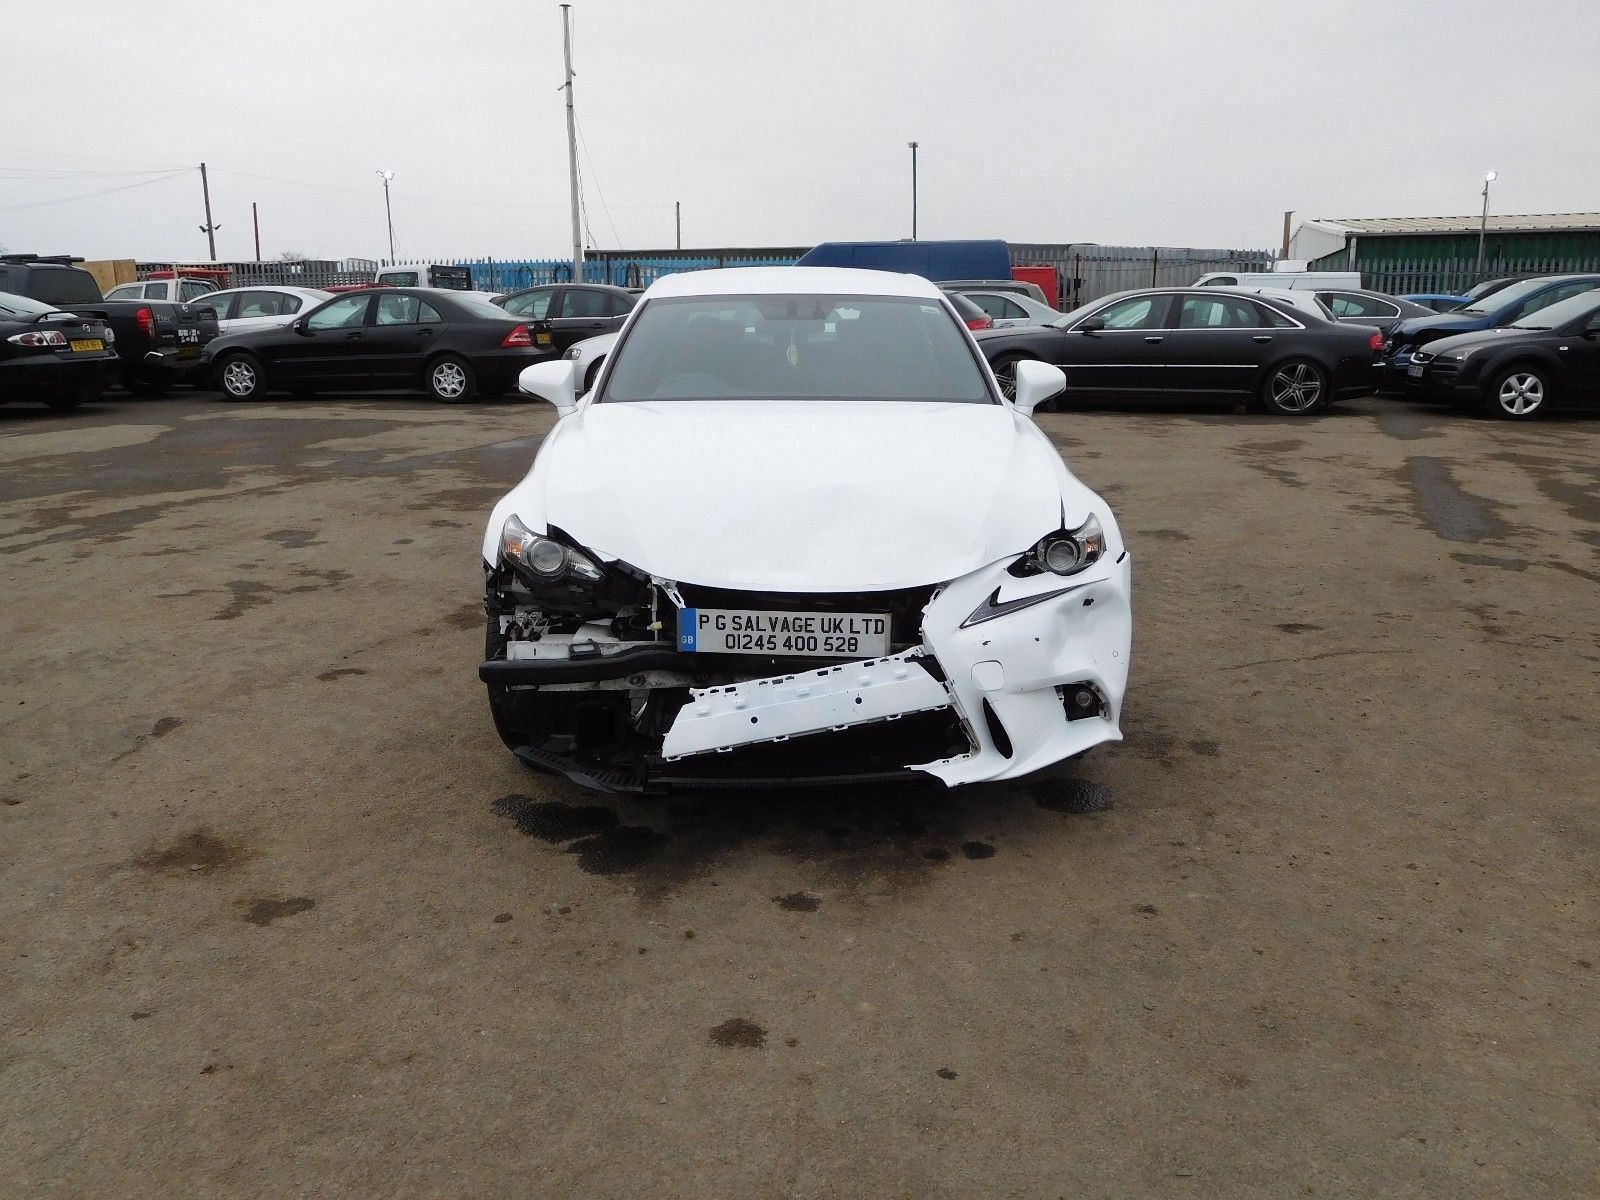 Ebay 2013 63 Lexus Is 300h Sport Hybrid 2 5 Petrol Auto Damaged